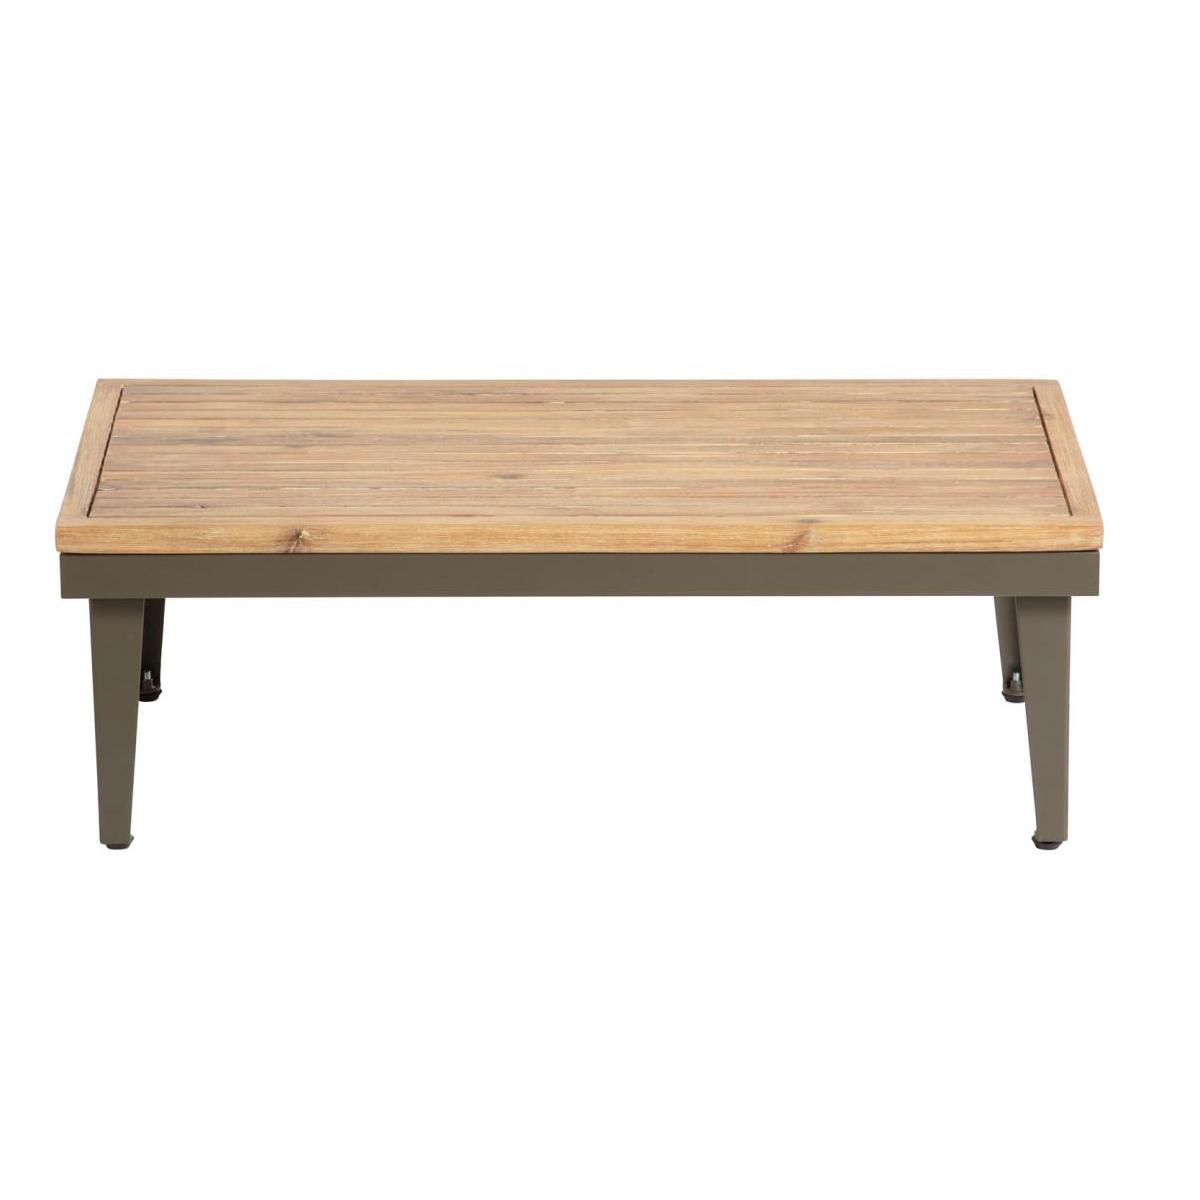 Table basse en alu et acacia (Bois)